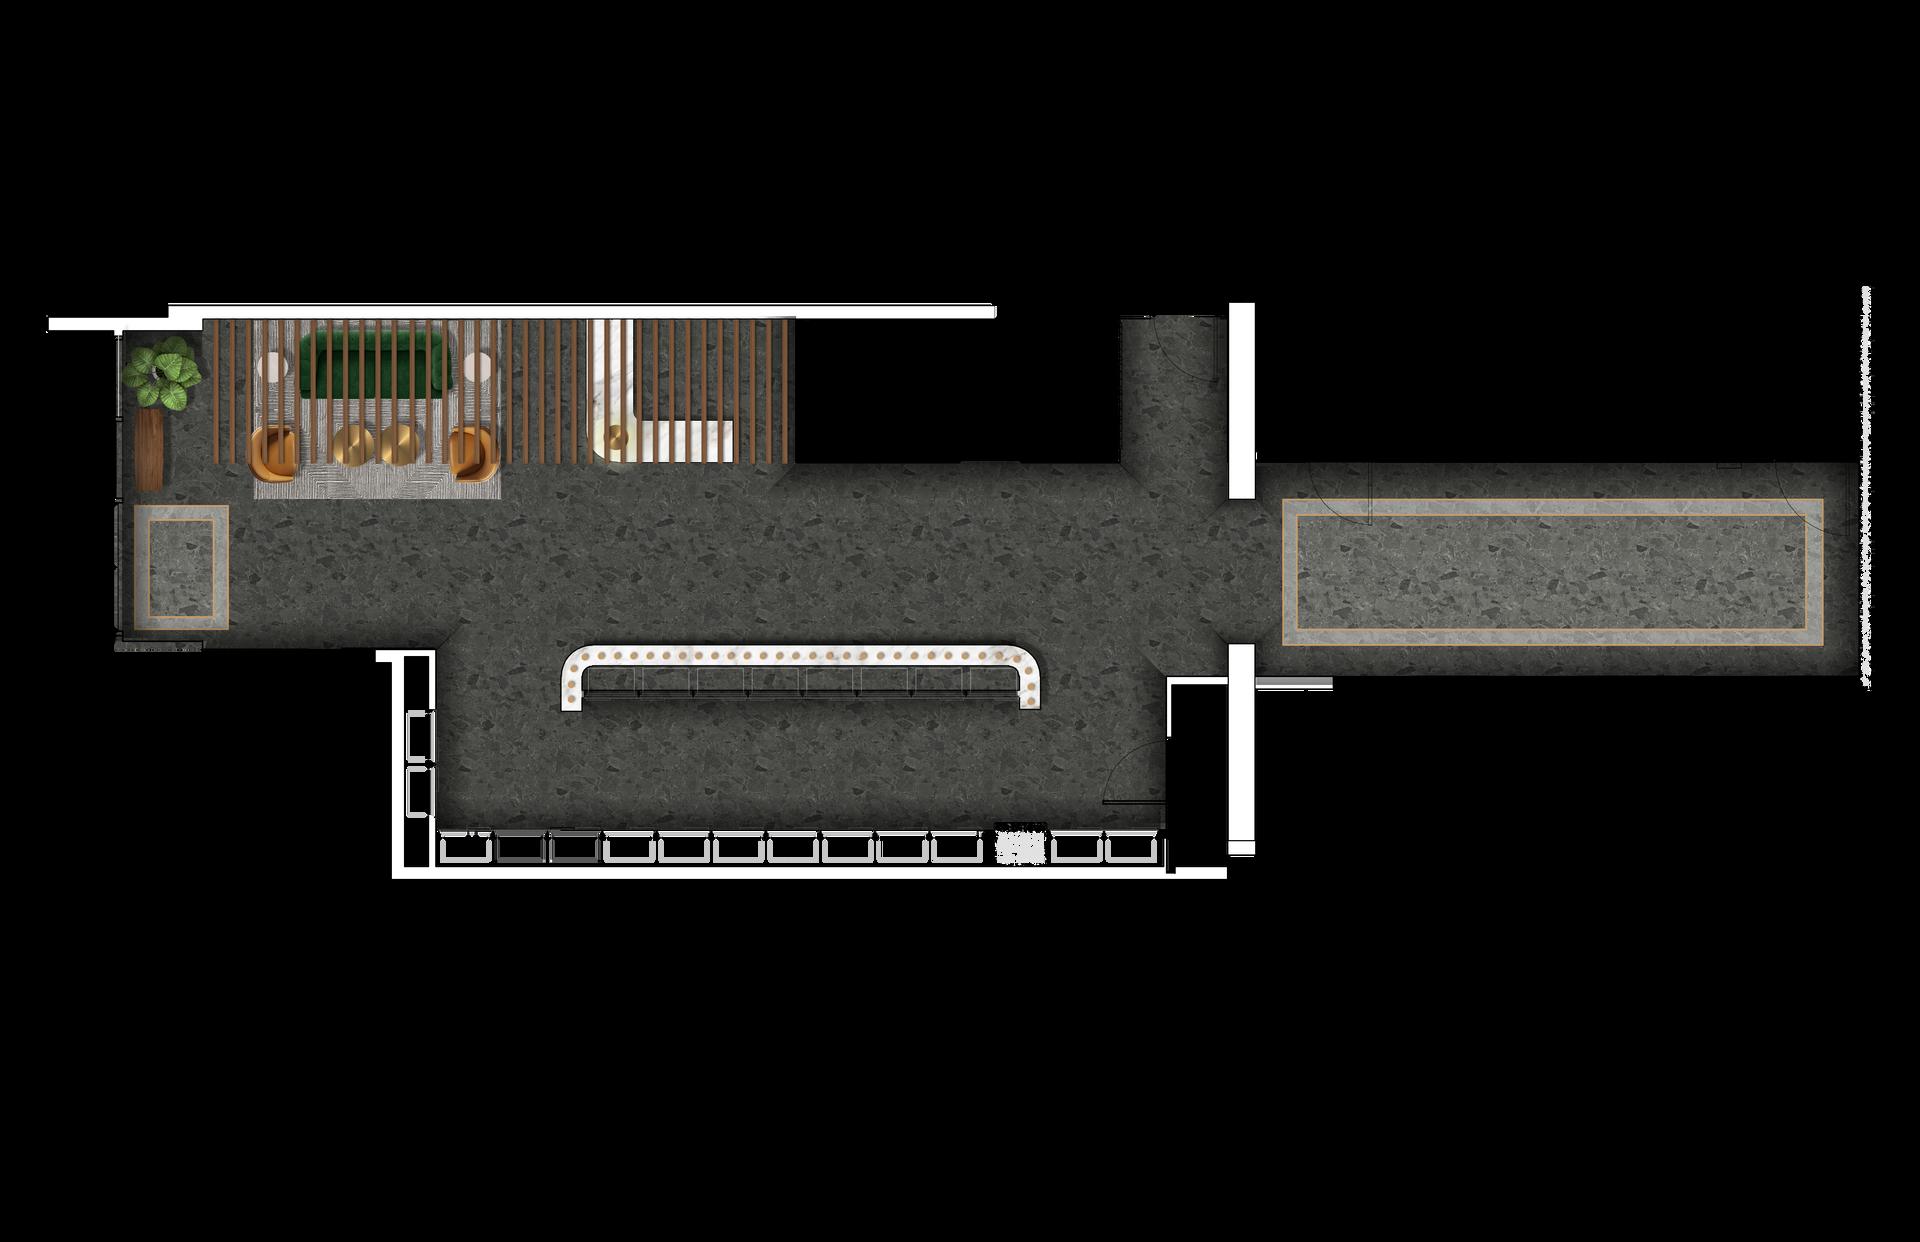 FlooringPlan_New_D4.png